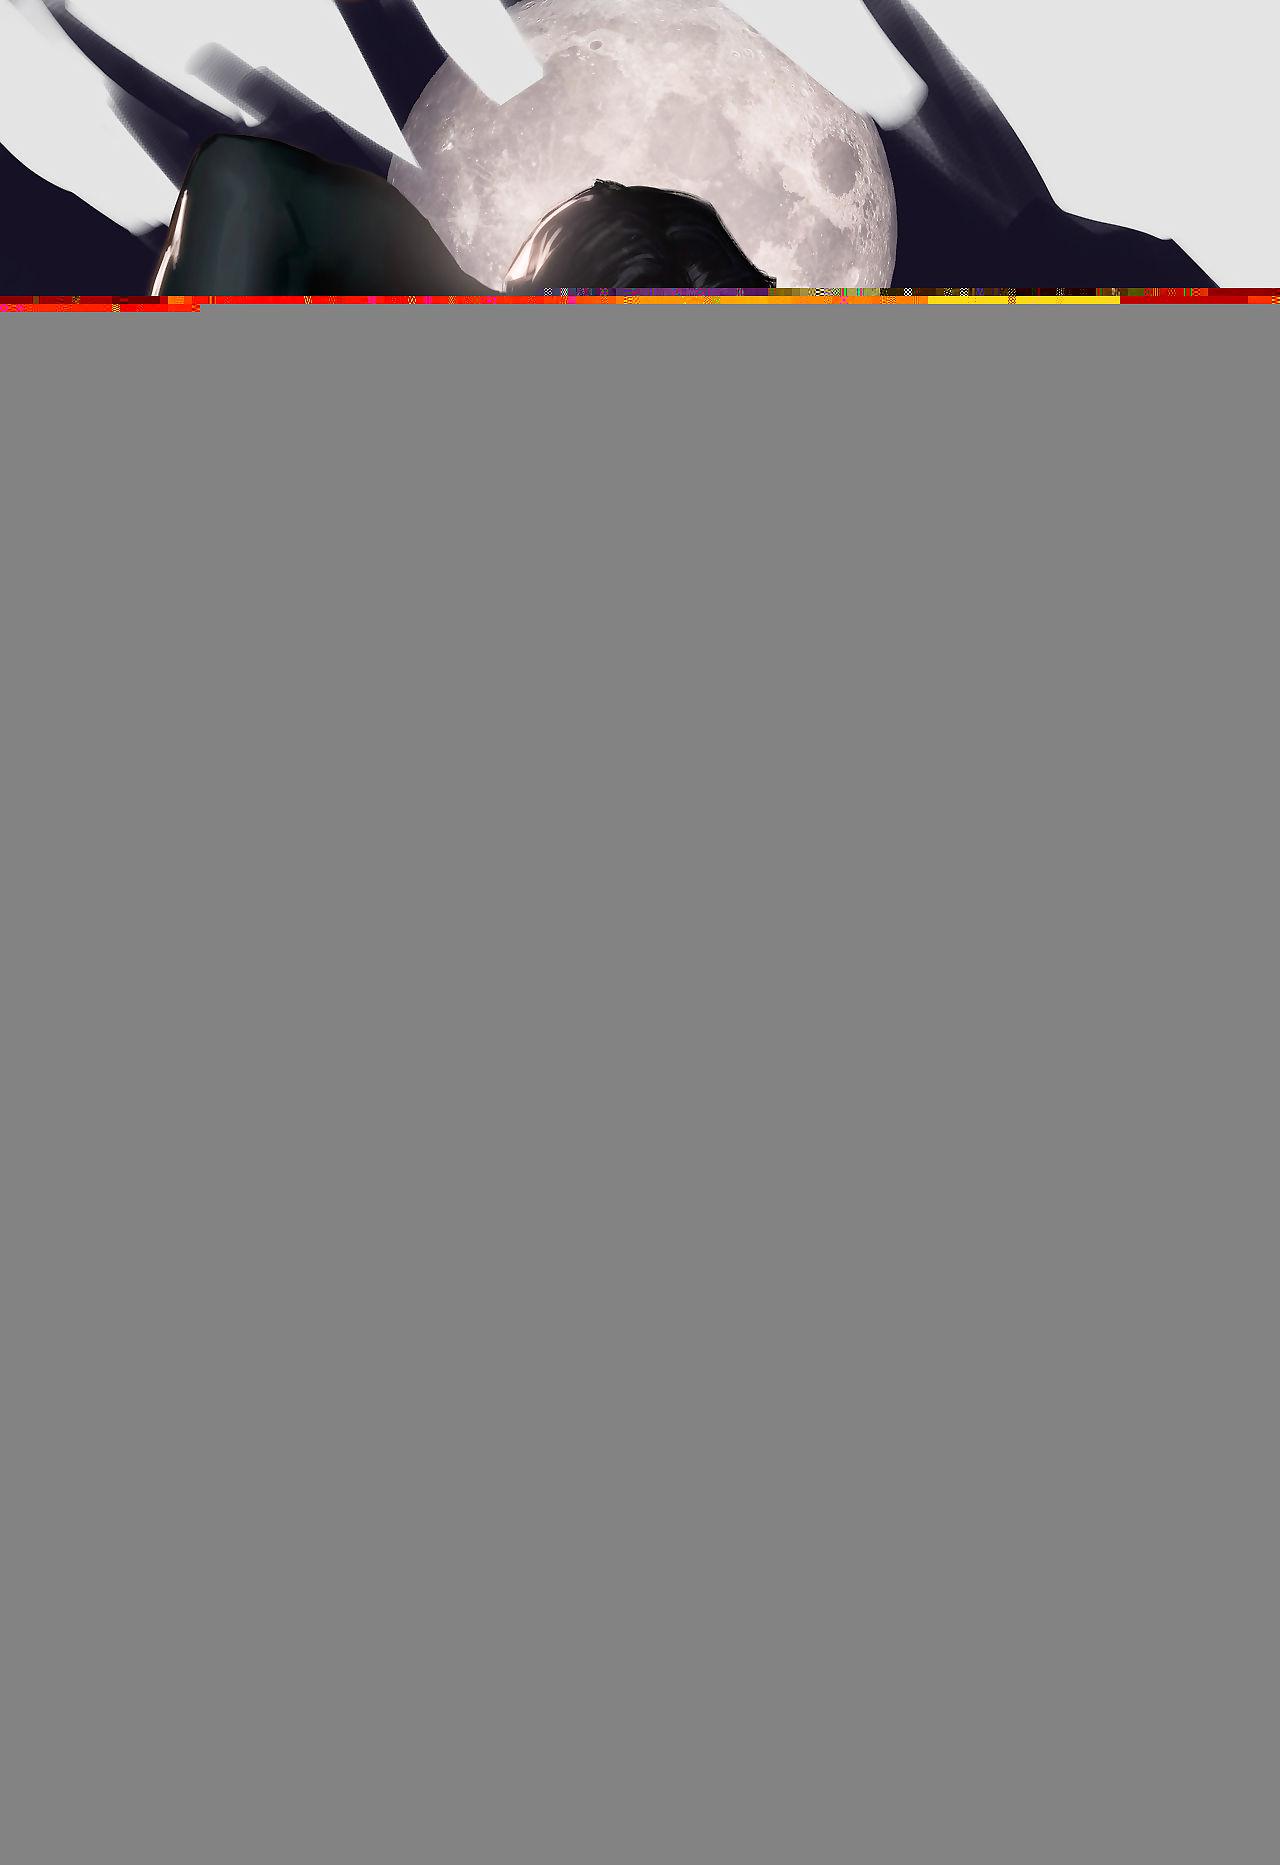 Nightwing/Dick Grayson - faithfulness 6